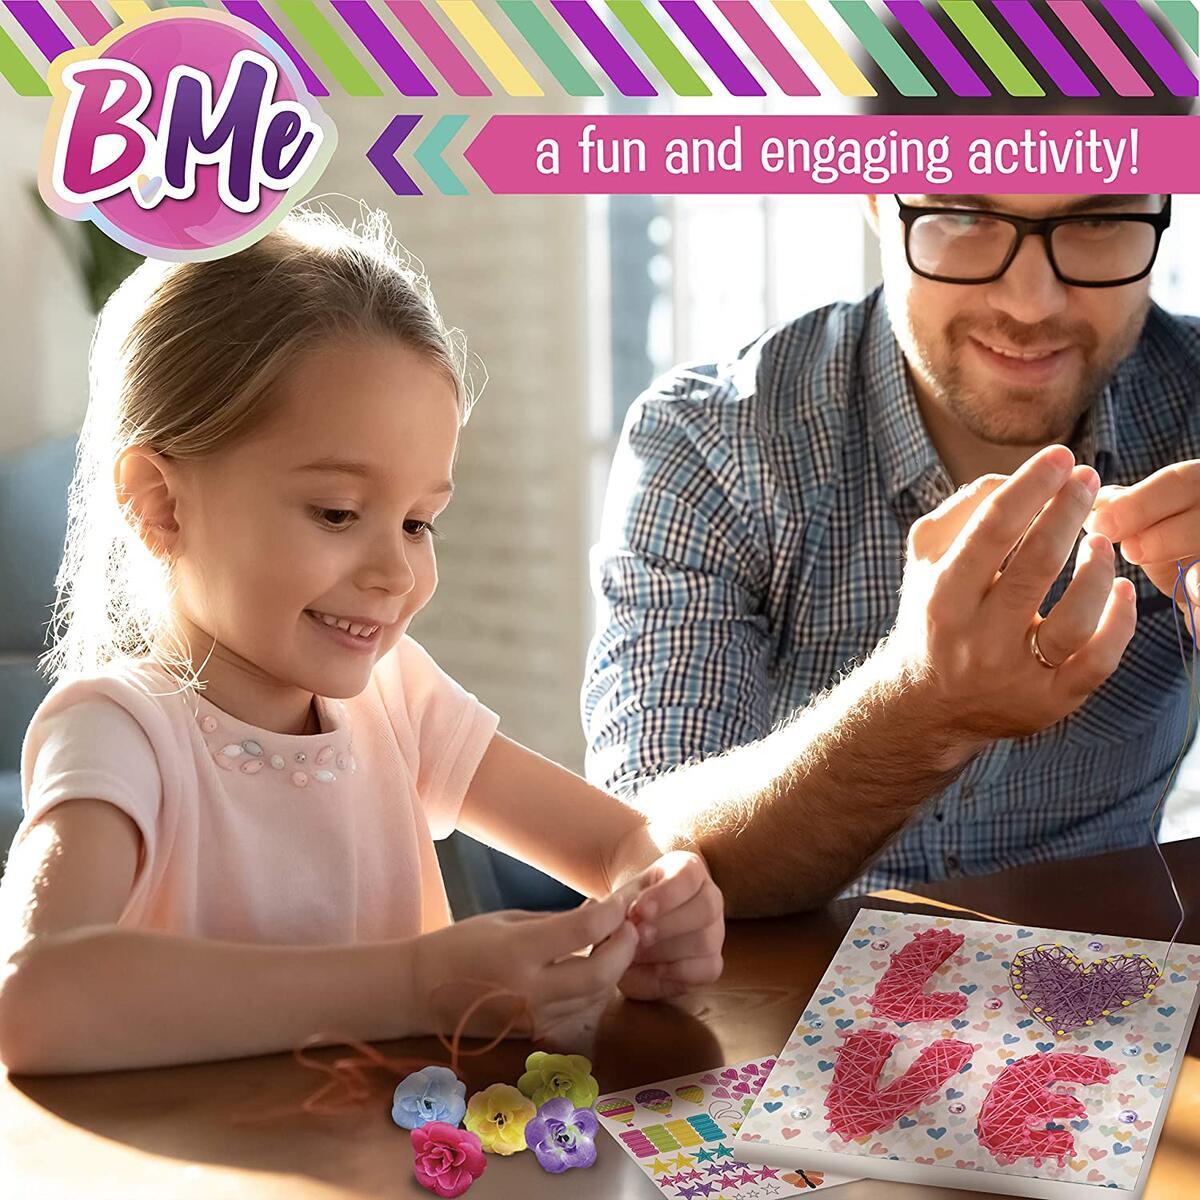 String Art Craft Mega Activity Set for Boys & Girls - Makes 4 Large String Art Room Décor Canvas Boards